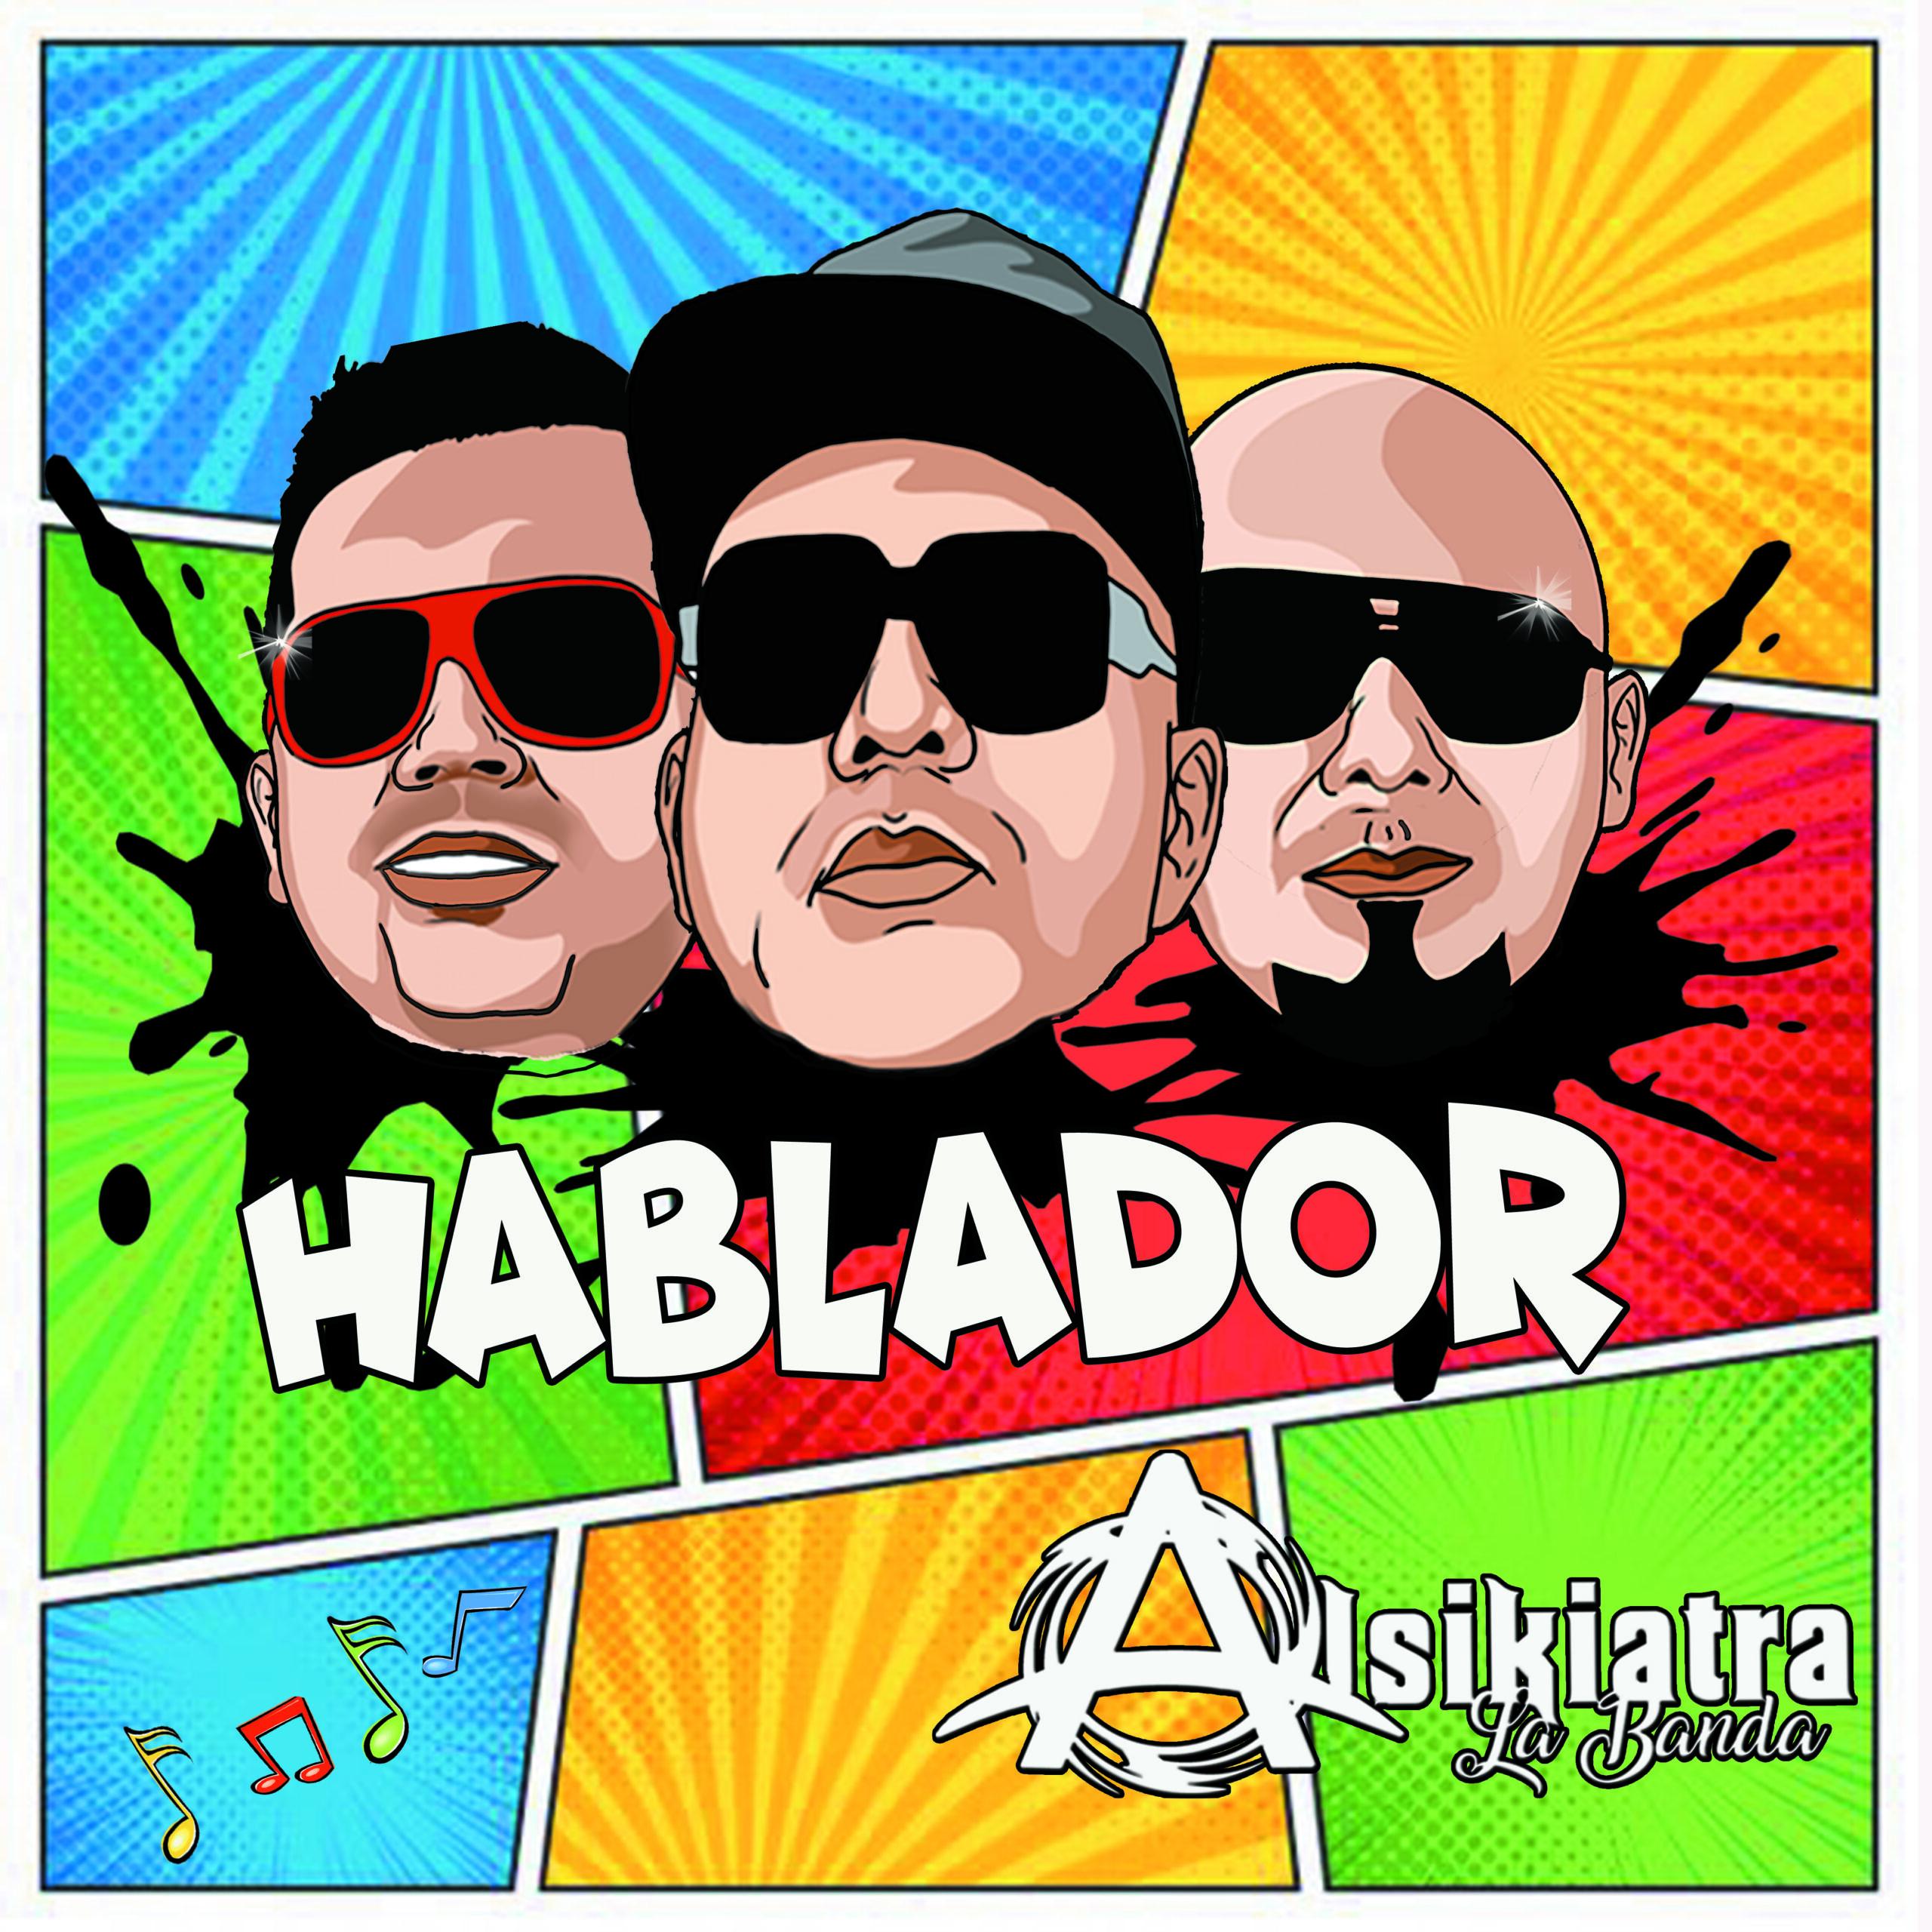 Alsikiatra La Banda «Hablador»